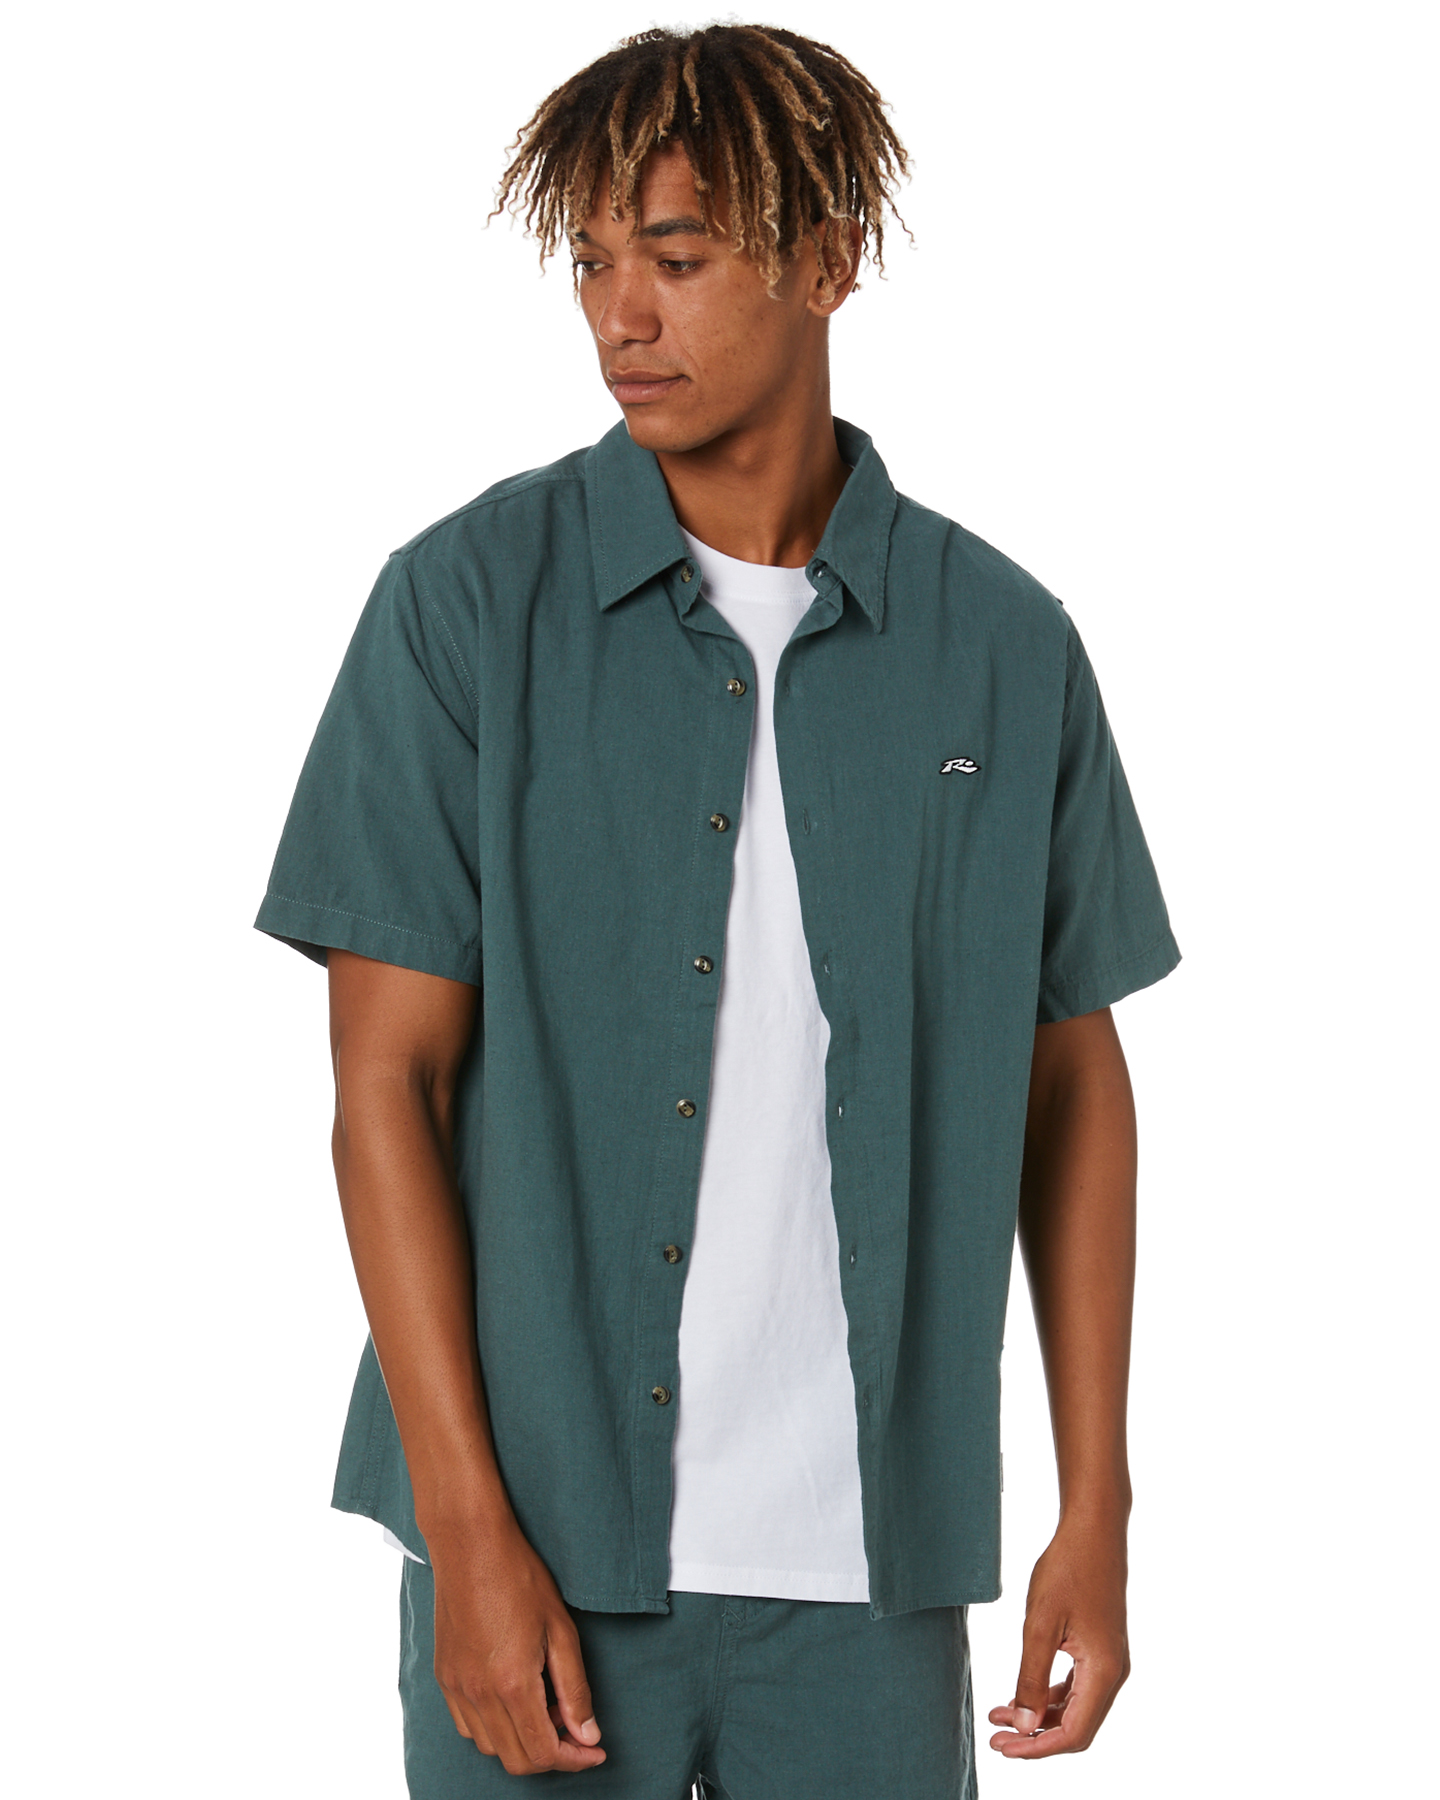 Rusty Undertone Mens Short Sleeve Linen Shirt Blue Coral